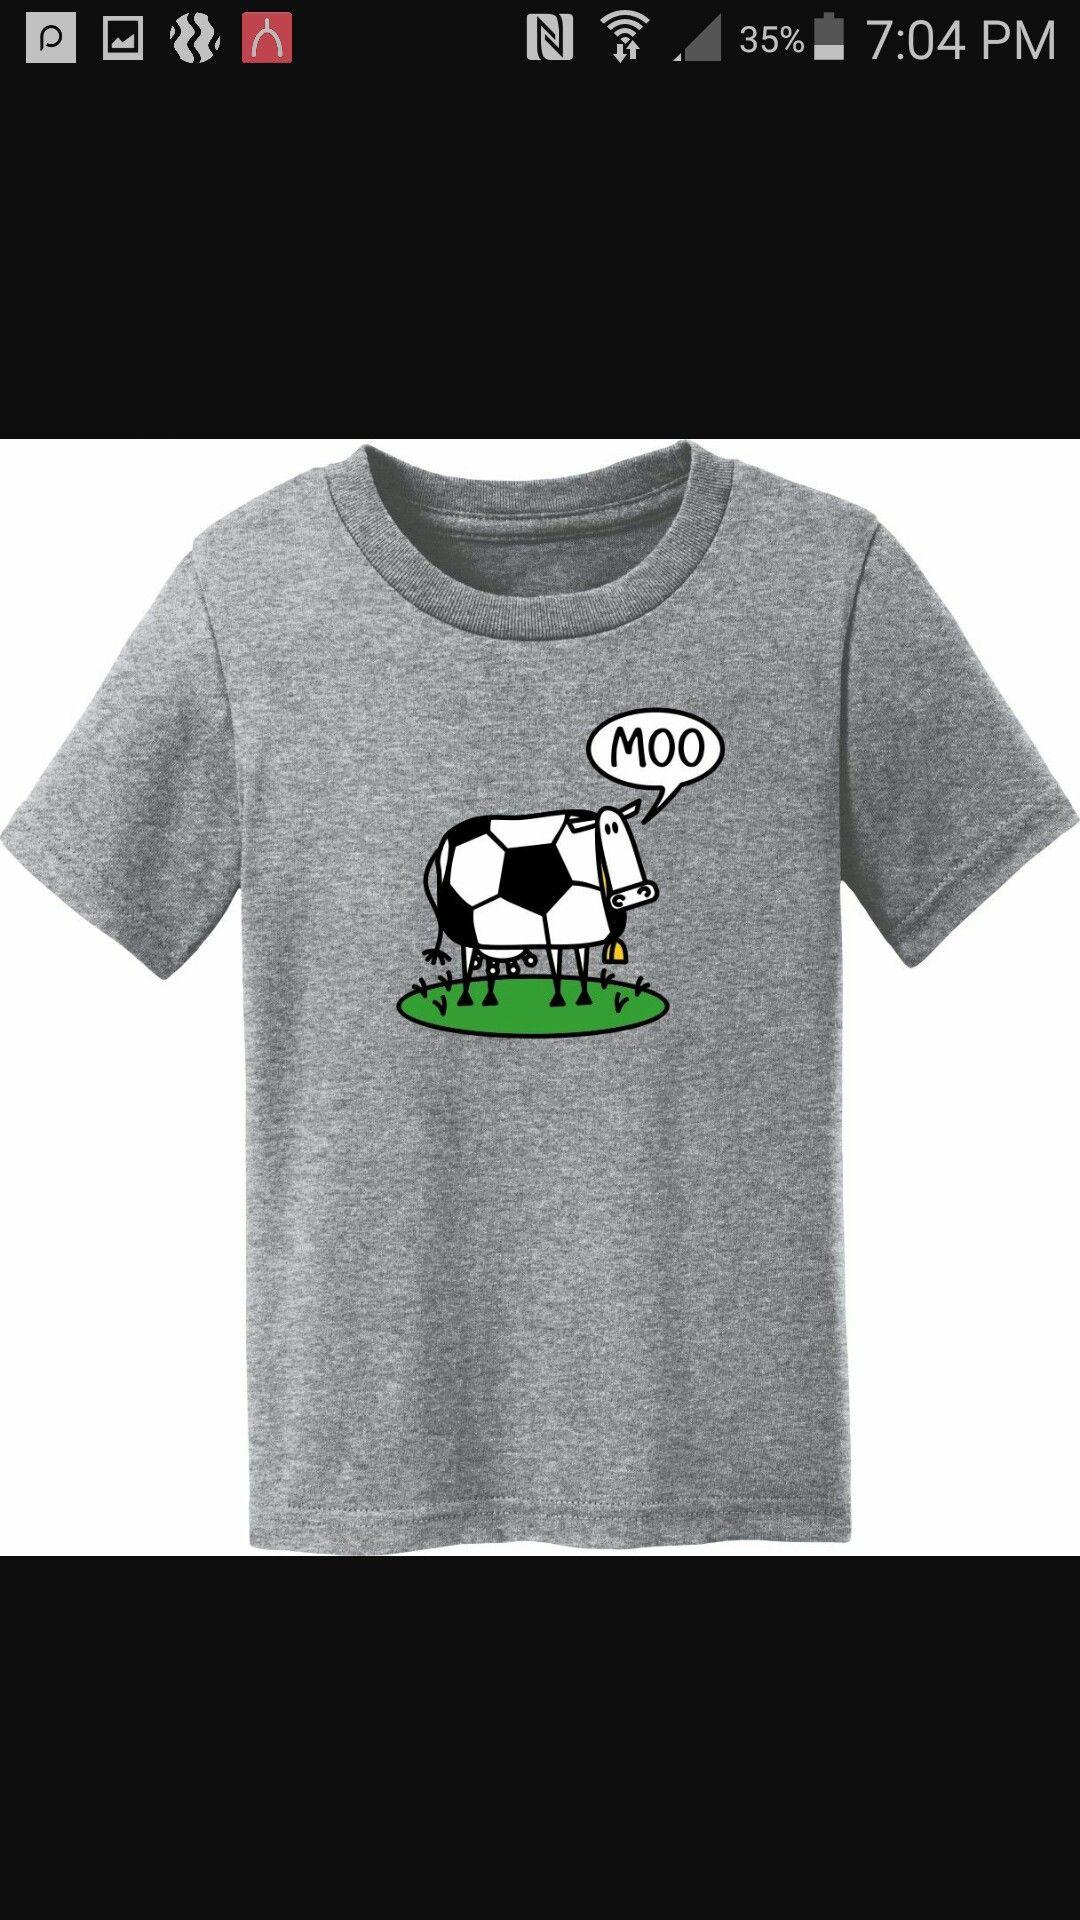 Pin by Maylynn 260 on Soccer Mens tops, Mens tshirts